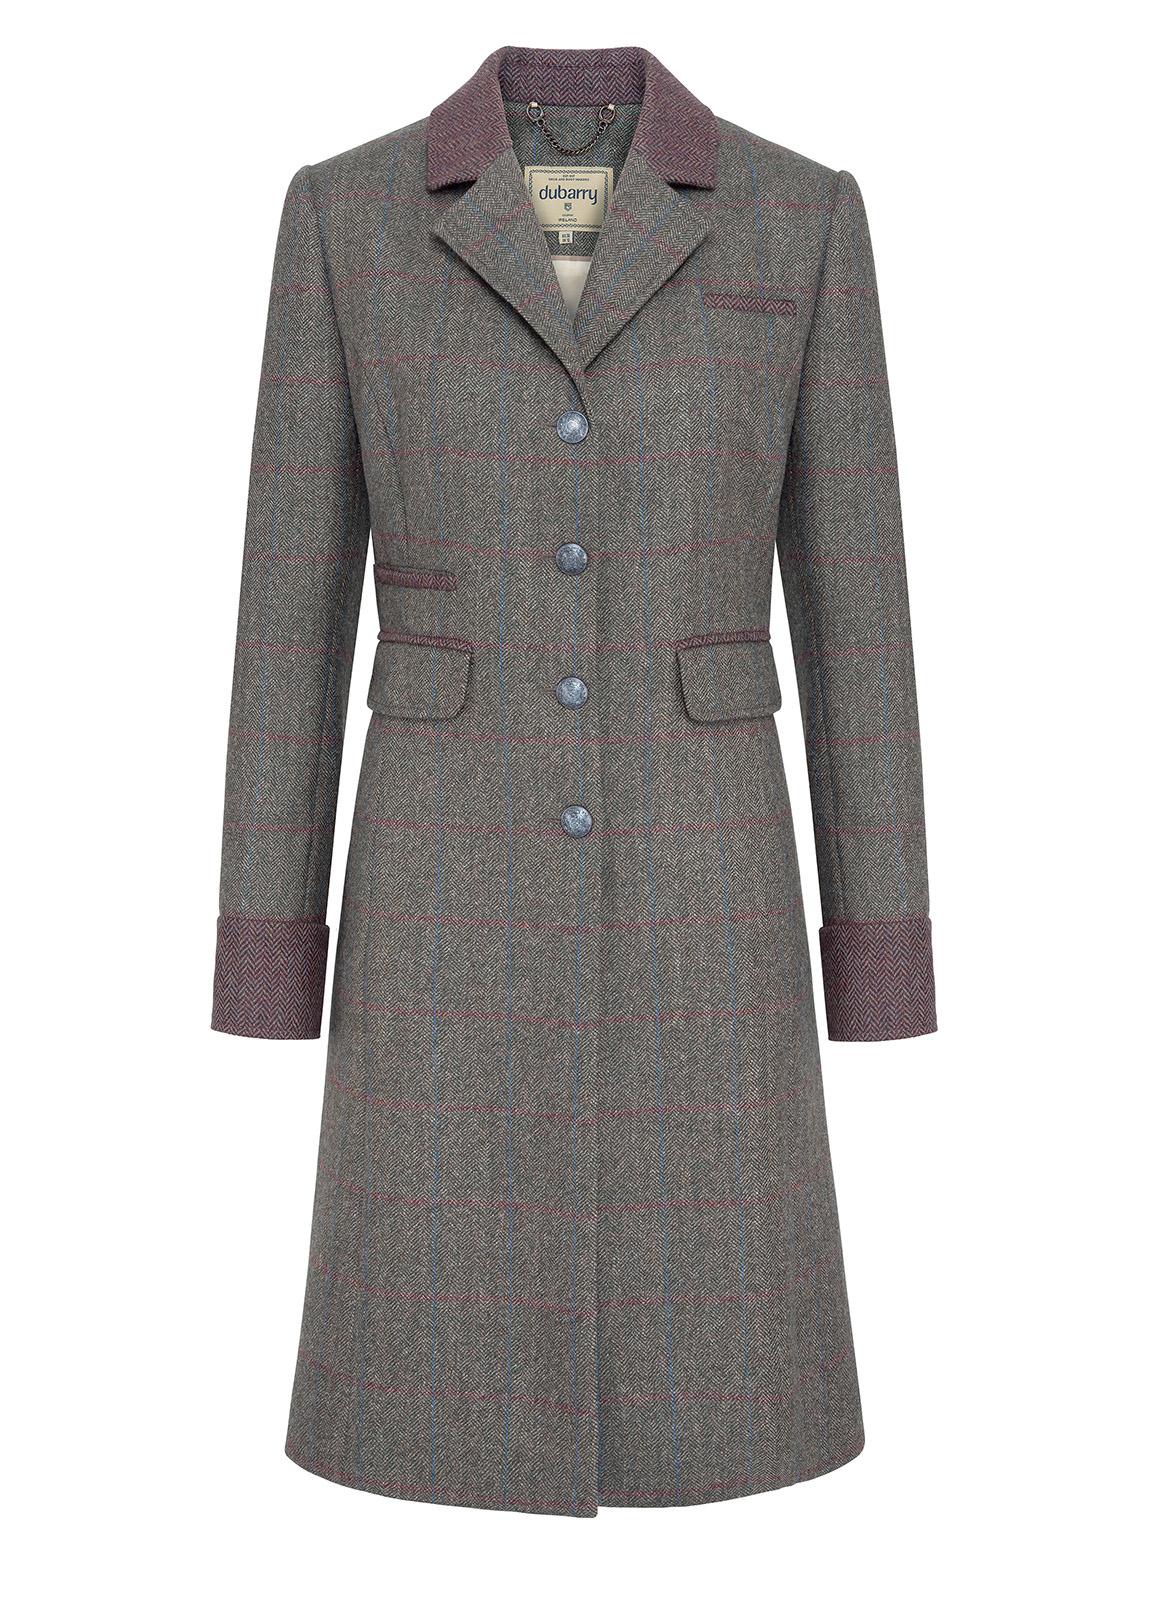 Dubarry_Blackthorn Tweed Jacket  - Moss_Image_2